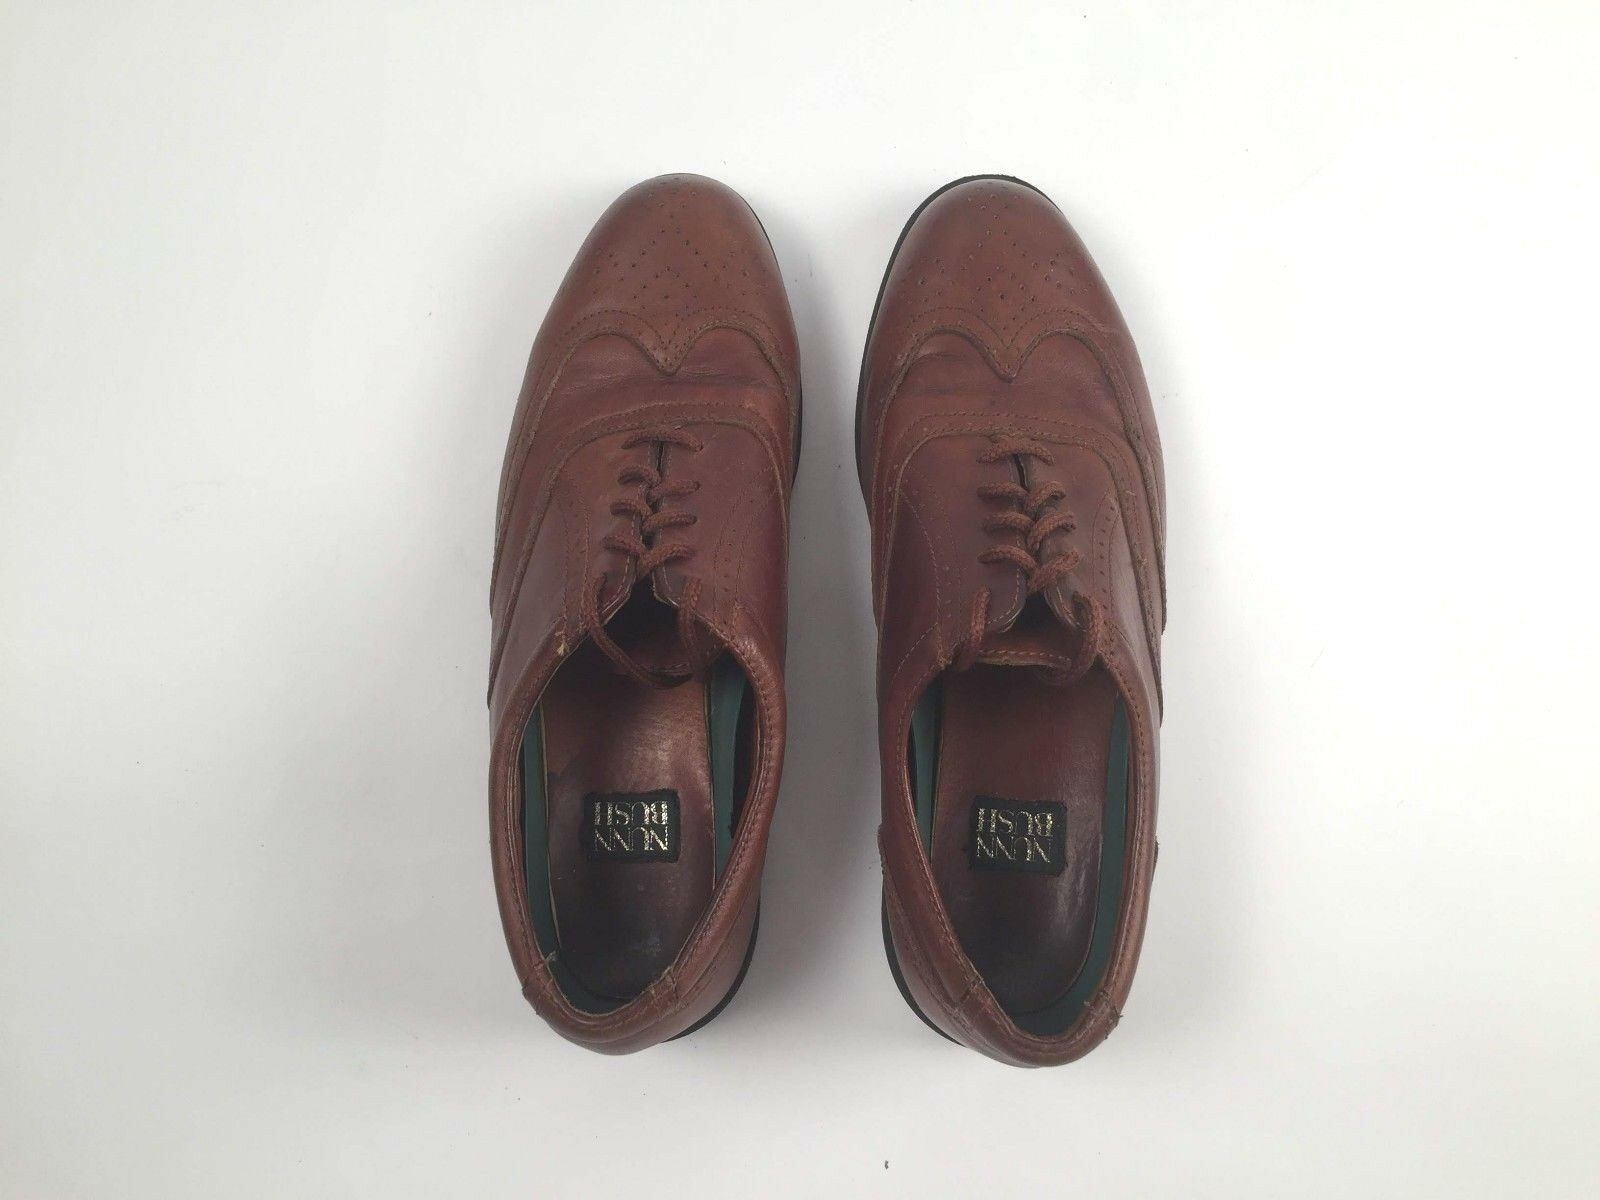 Men's Nunn Bush Brown Leather Oxford Medium Wingtip Dress Shoes 10 Medium Oxford - EUC fe5309